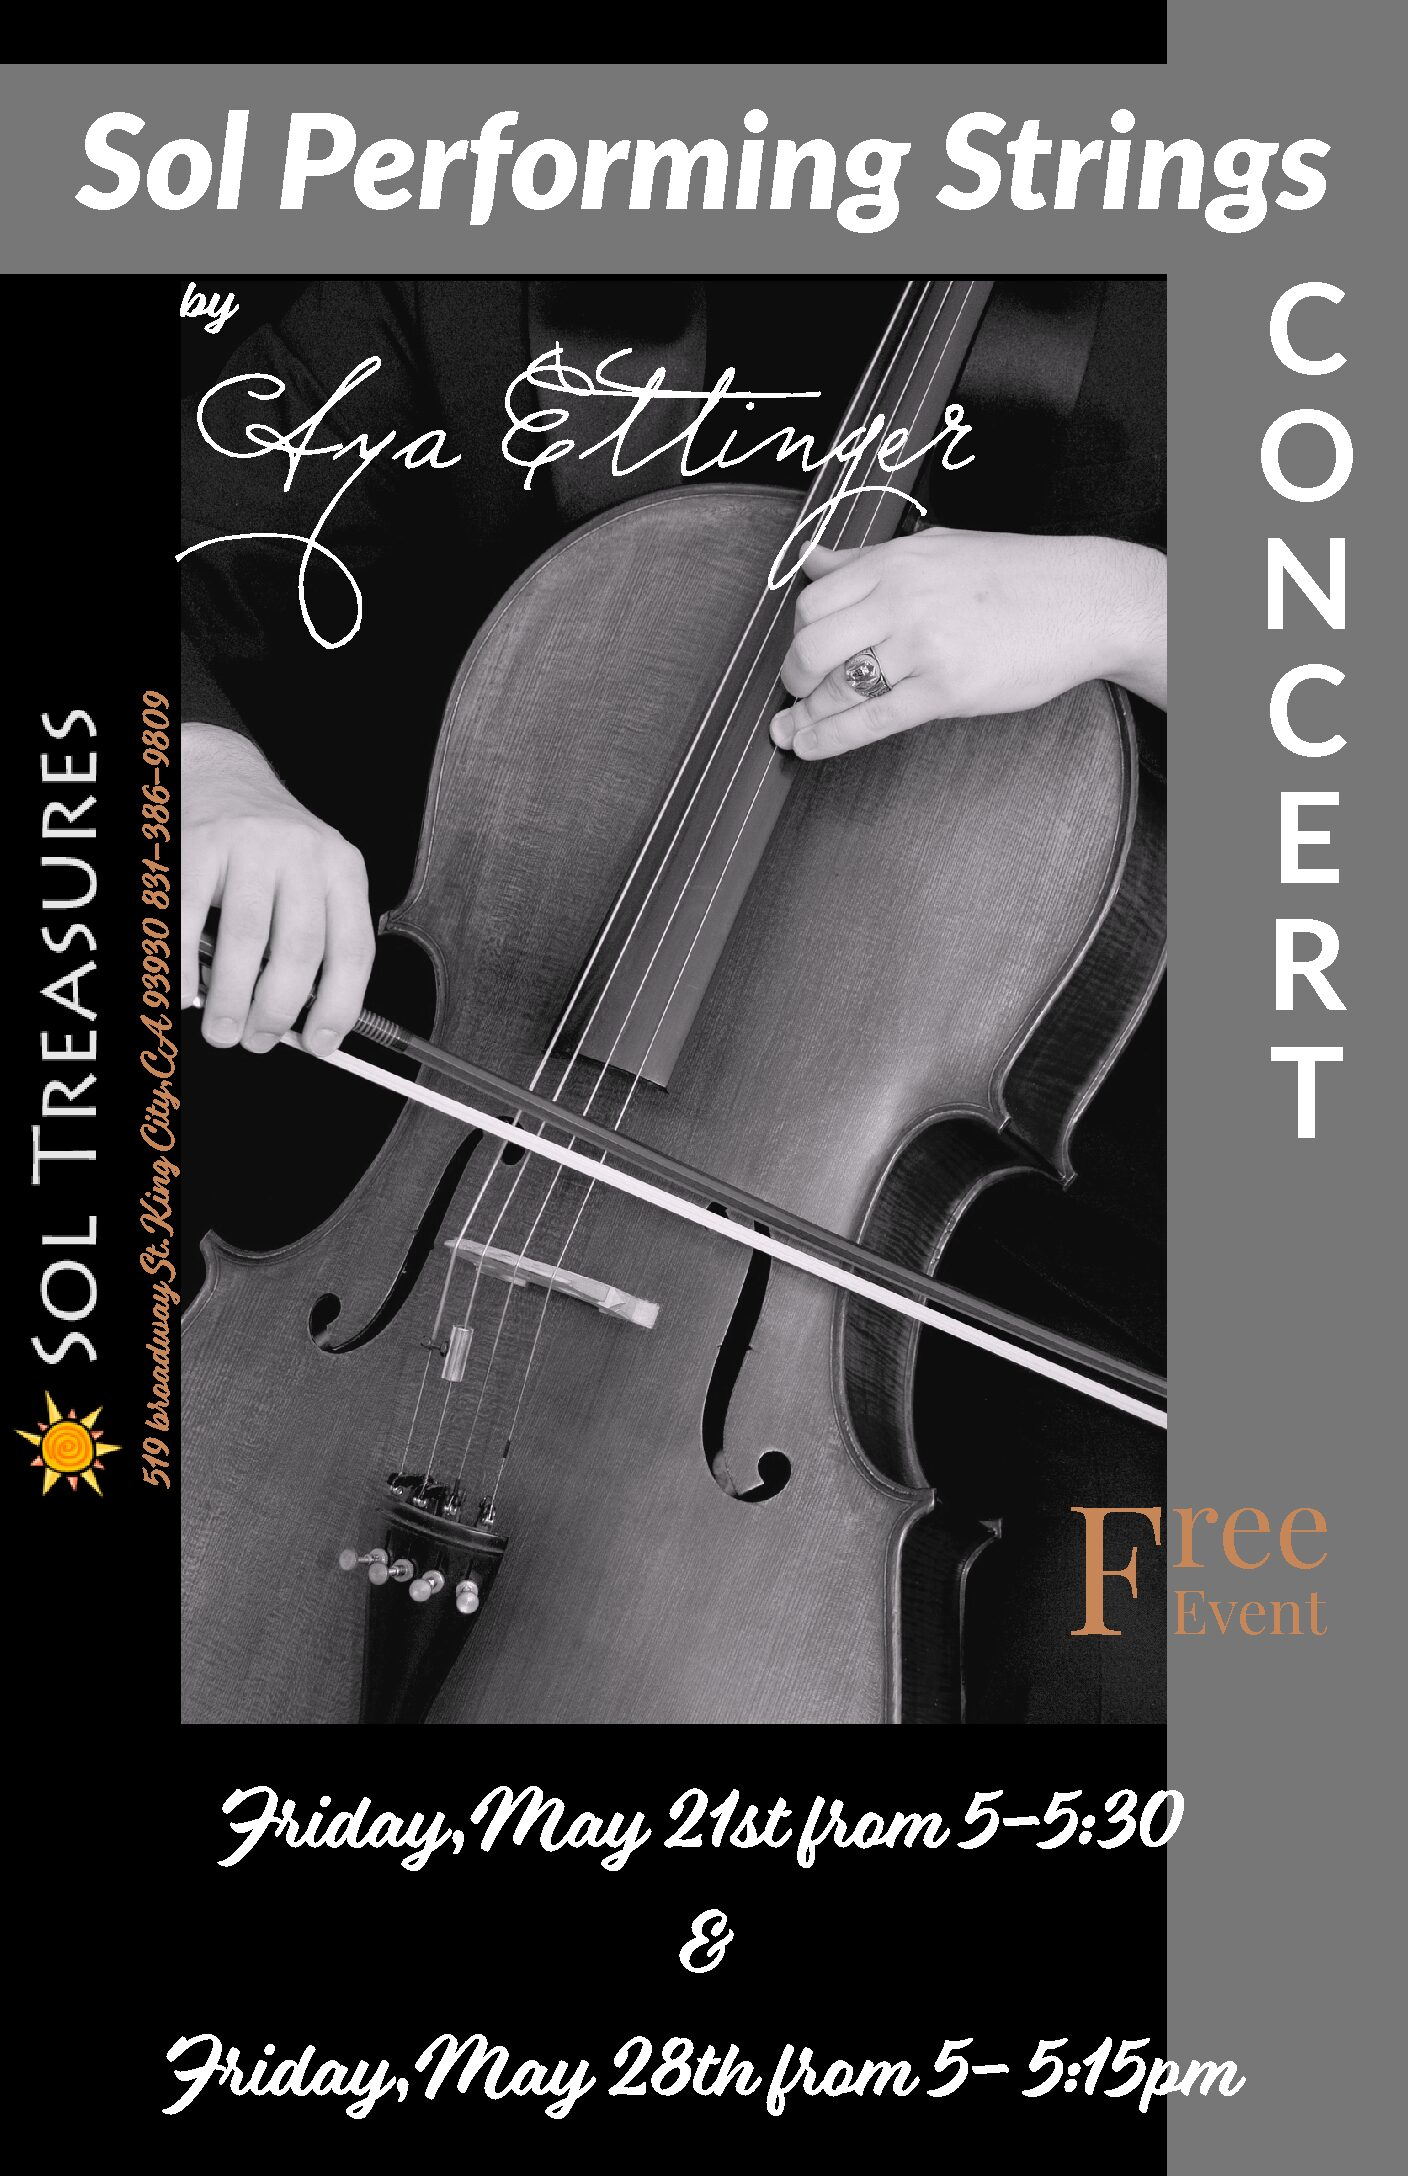 Sol Performing Strings Concert